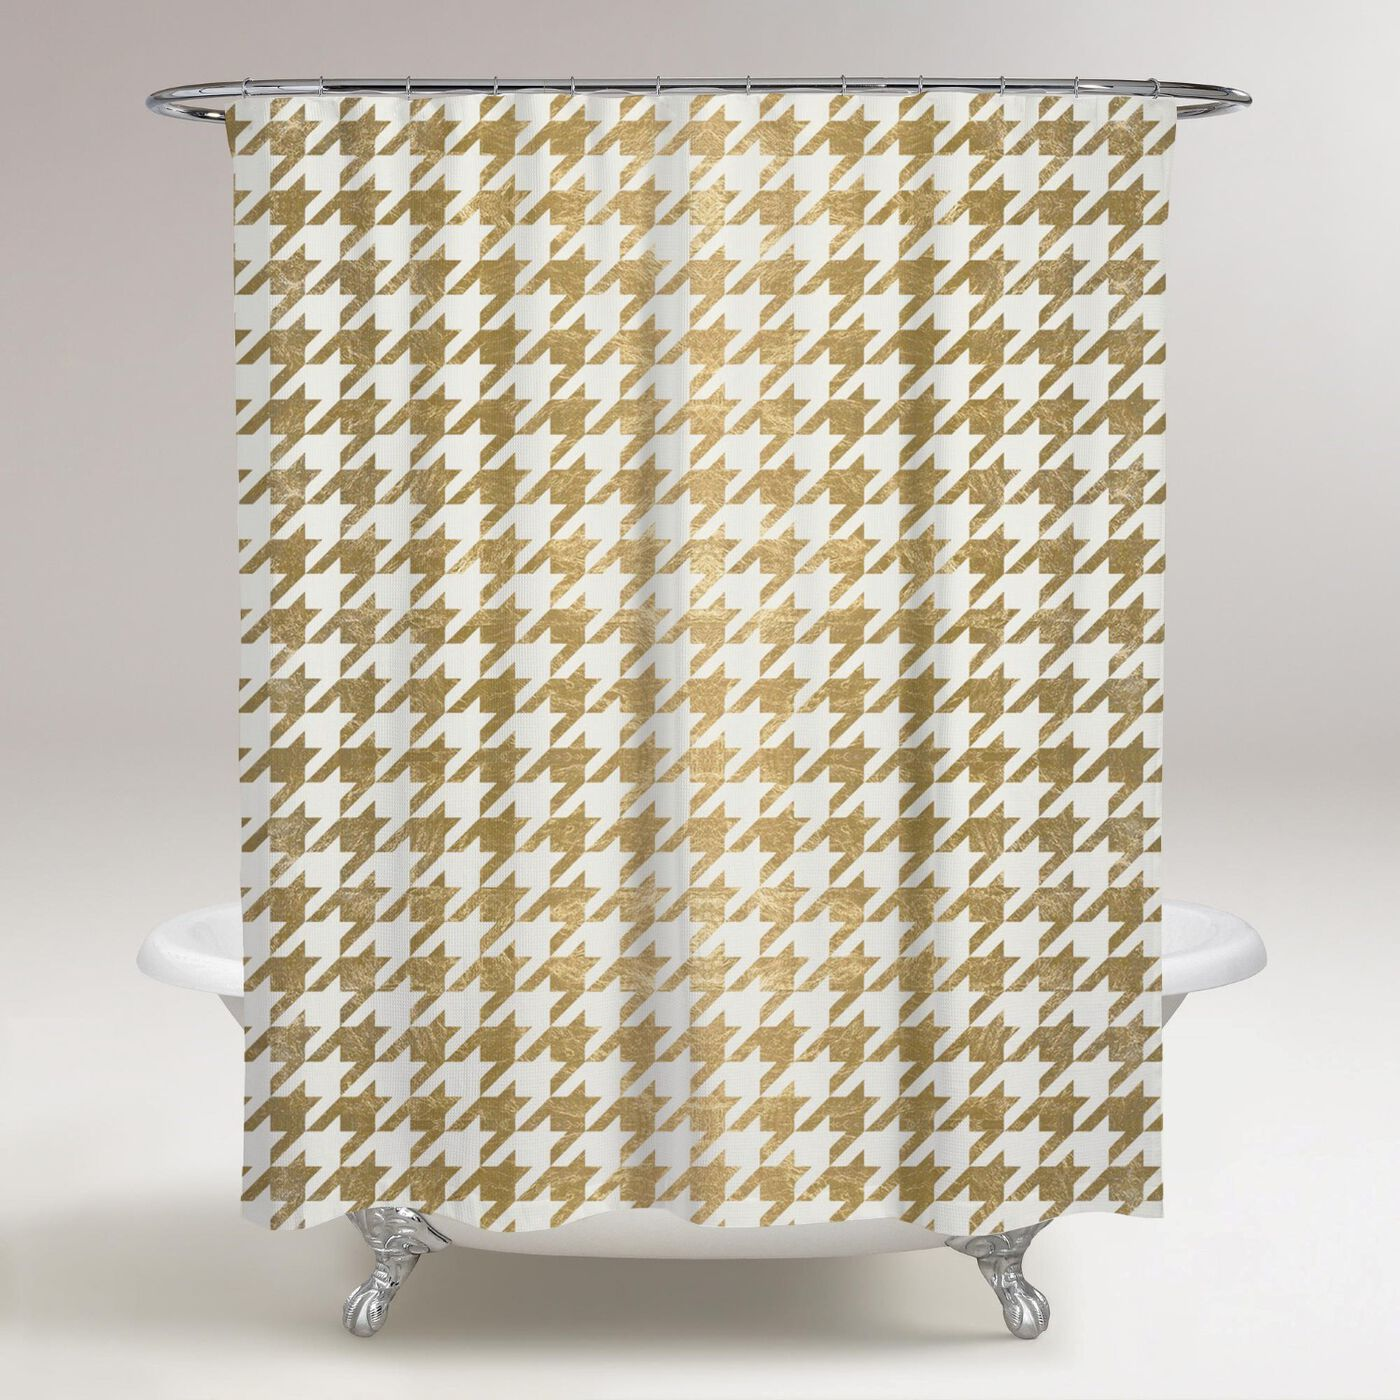 Golden Houndstooth Shower Curtain